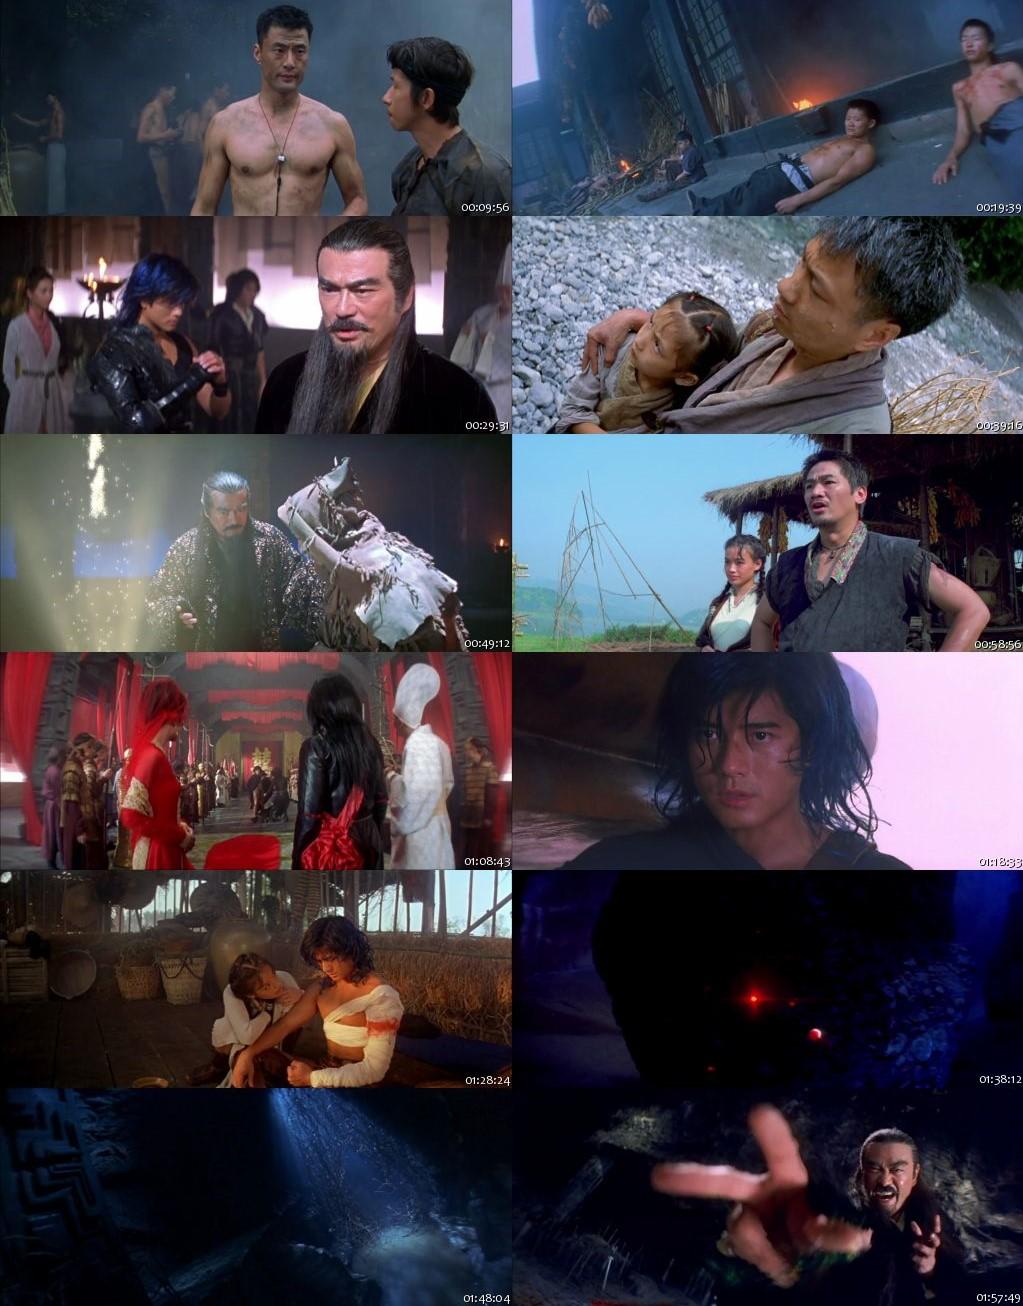 The Storm Riders 1998 Full Movie Online Watch BRRip 720p Dual Audio